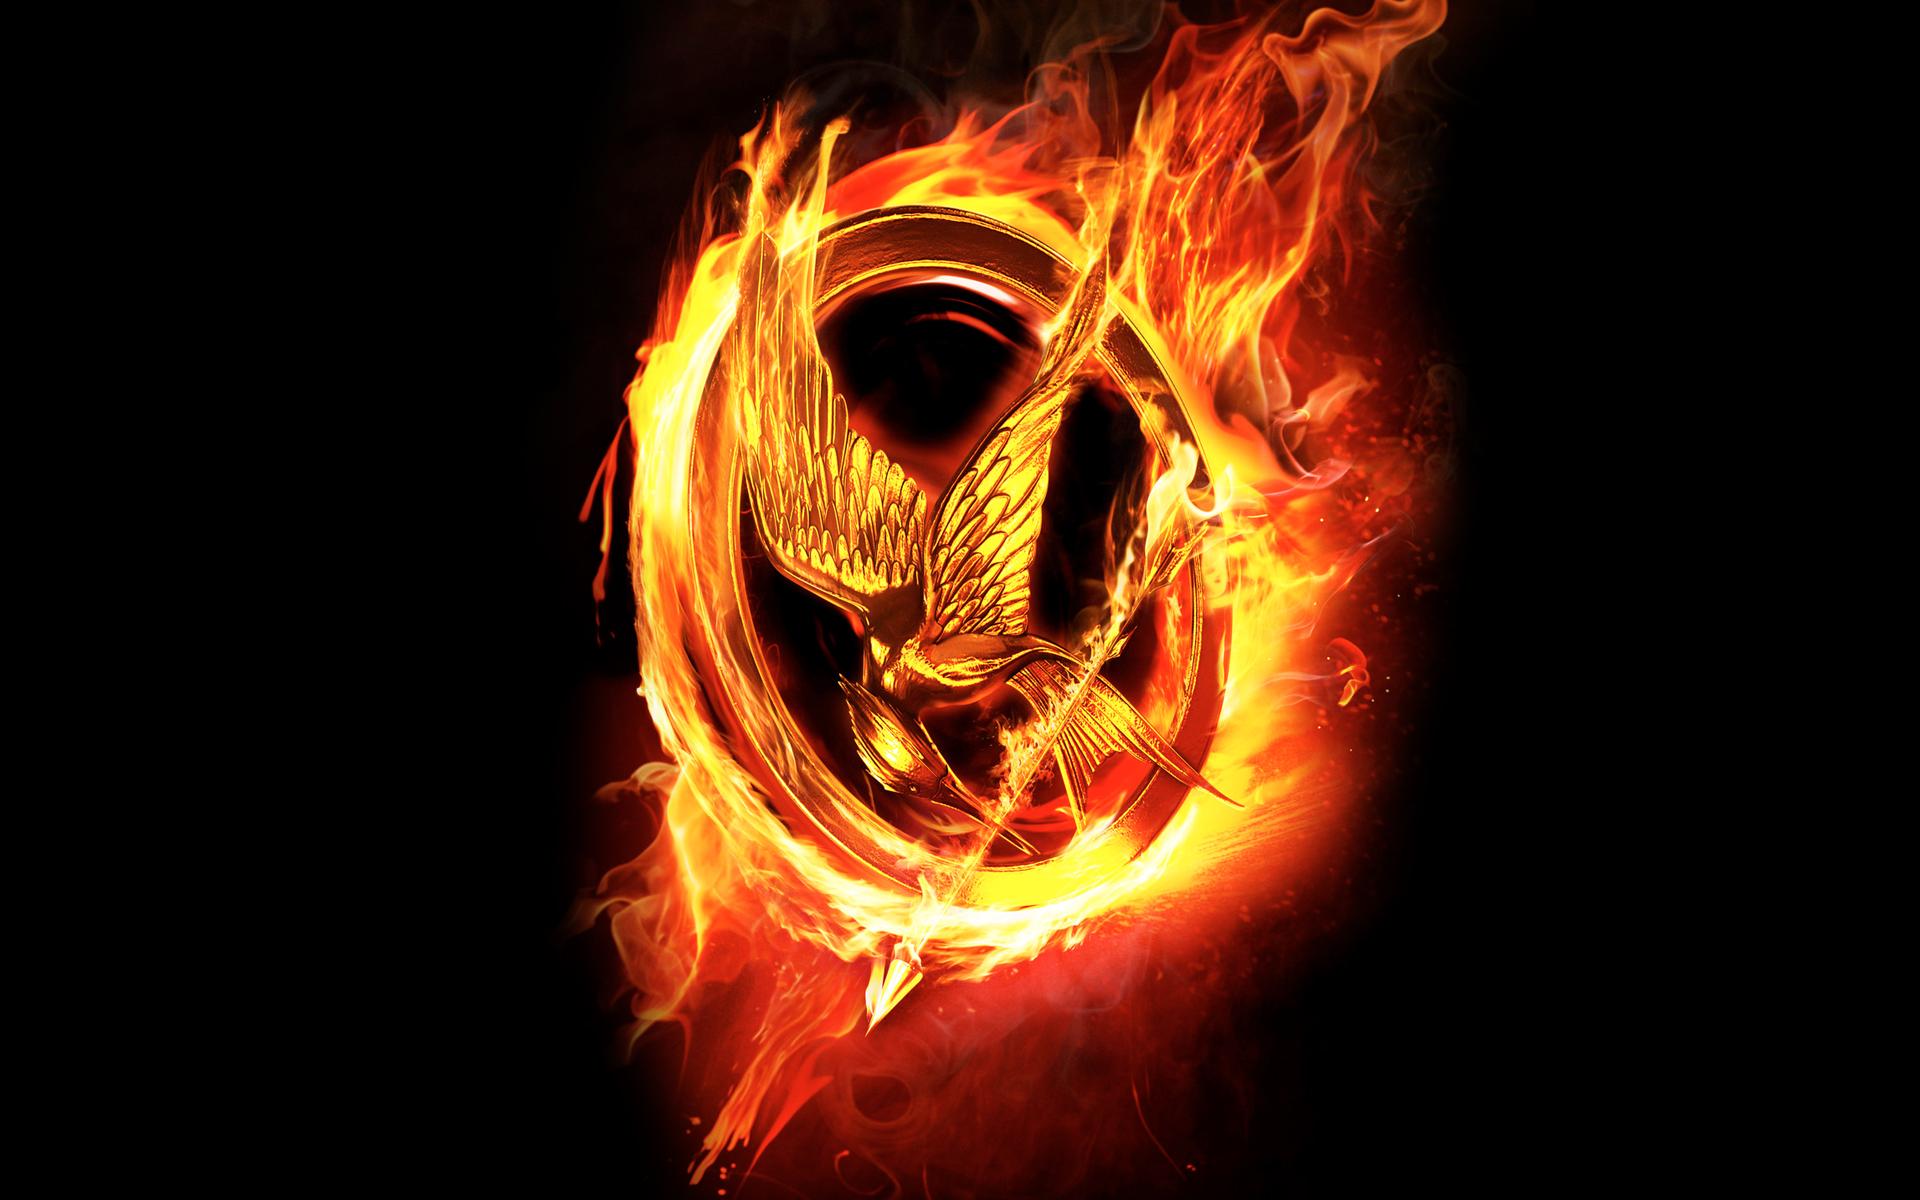 The Hunger Games Wallpaper   The Hunger Games Wallpaper 1920x1200